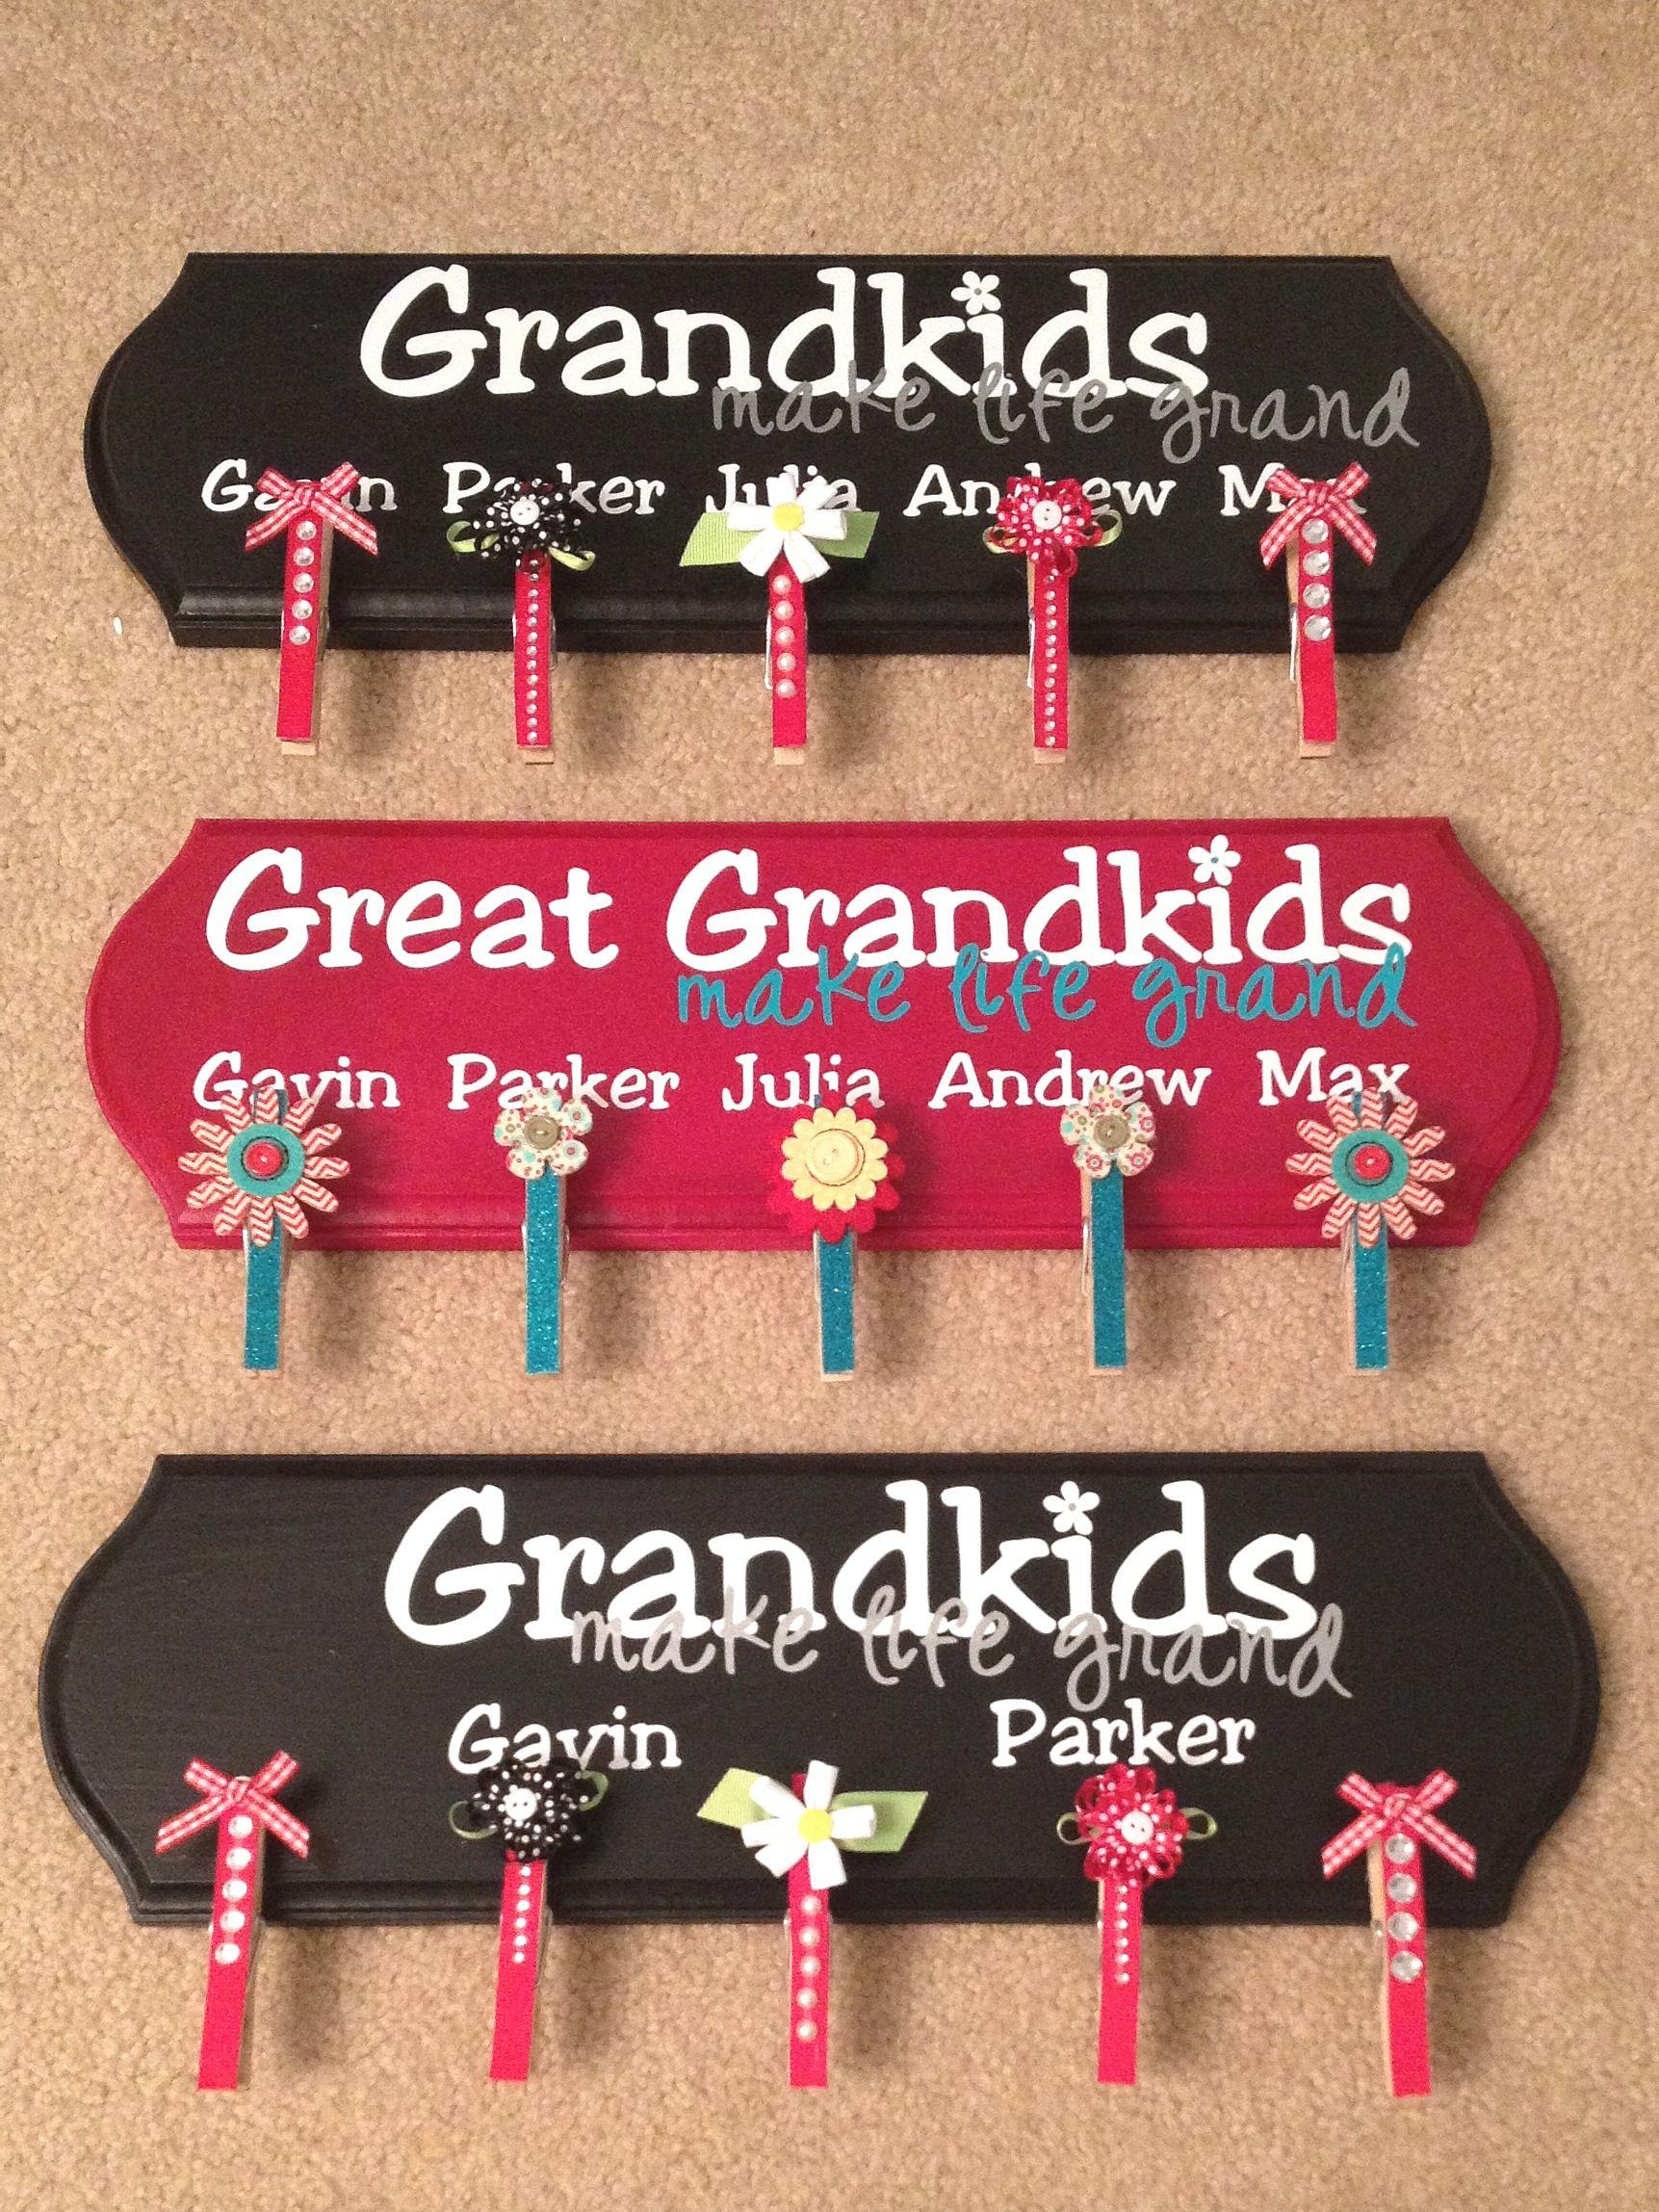 Grandma Gift- Grandkids make life grand | Gifts | Pinterest ...